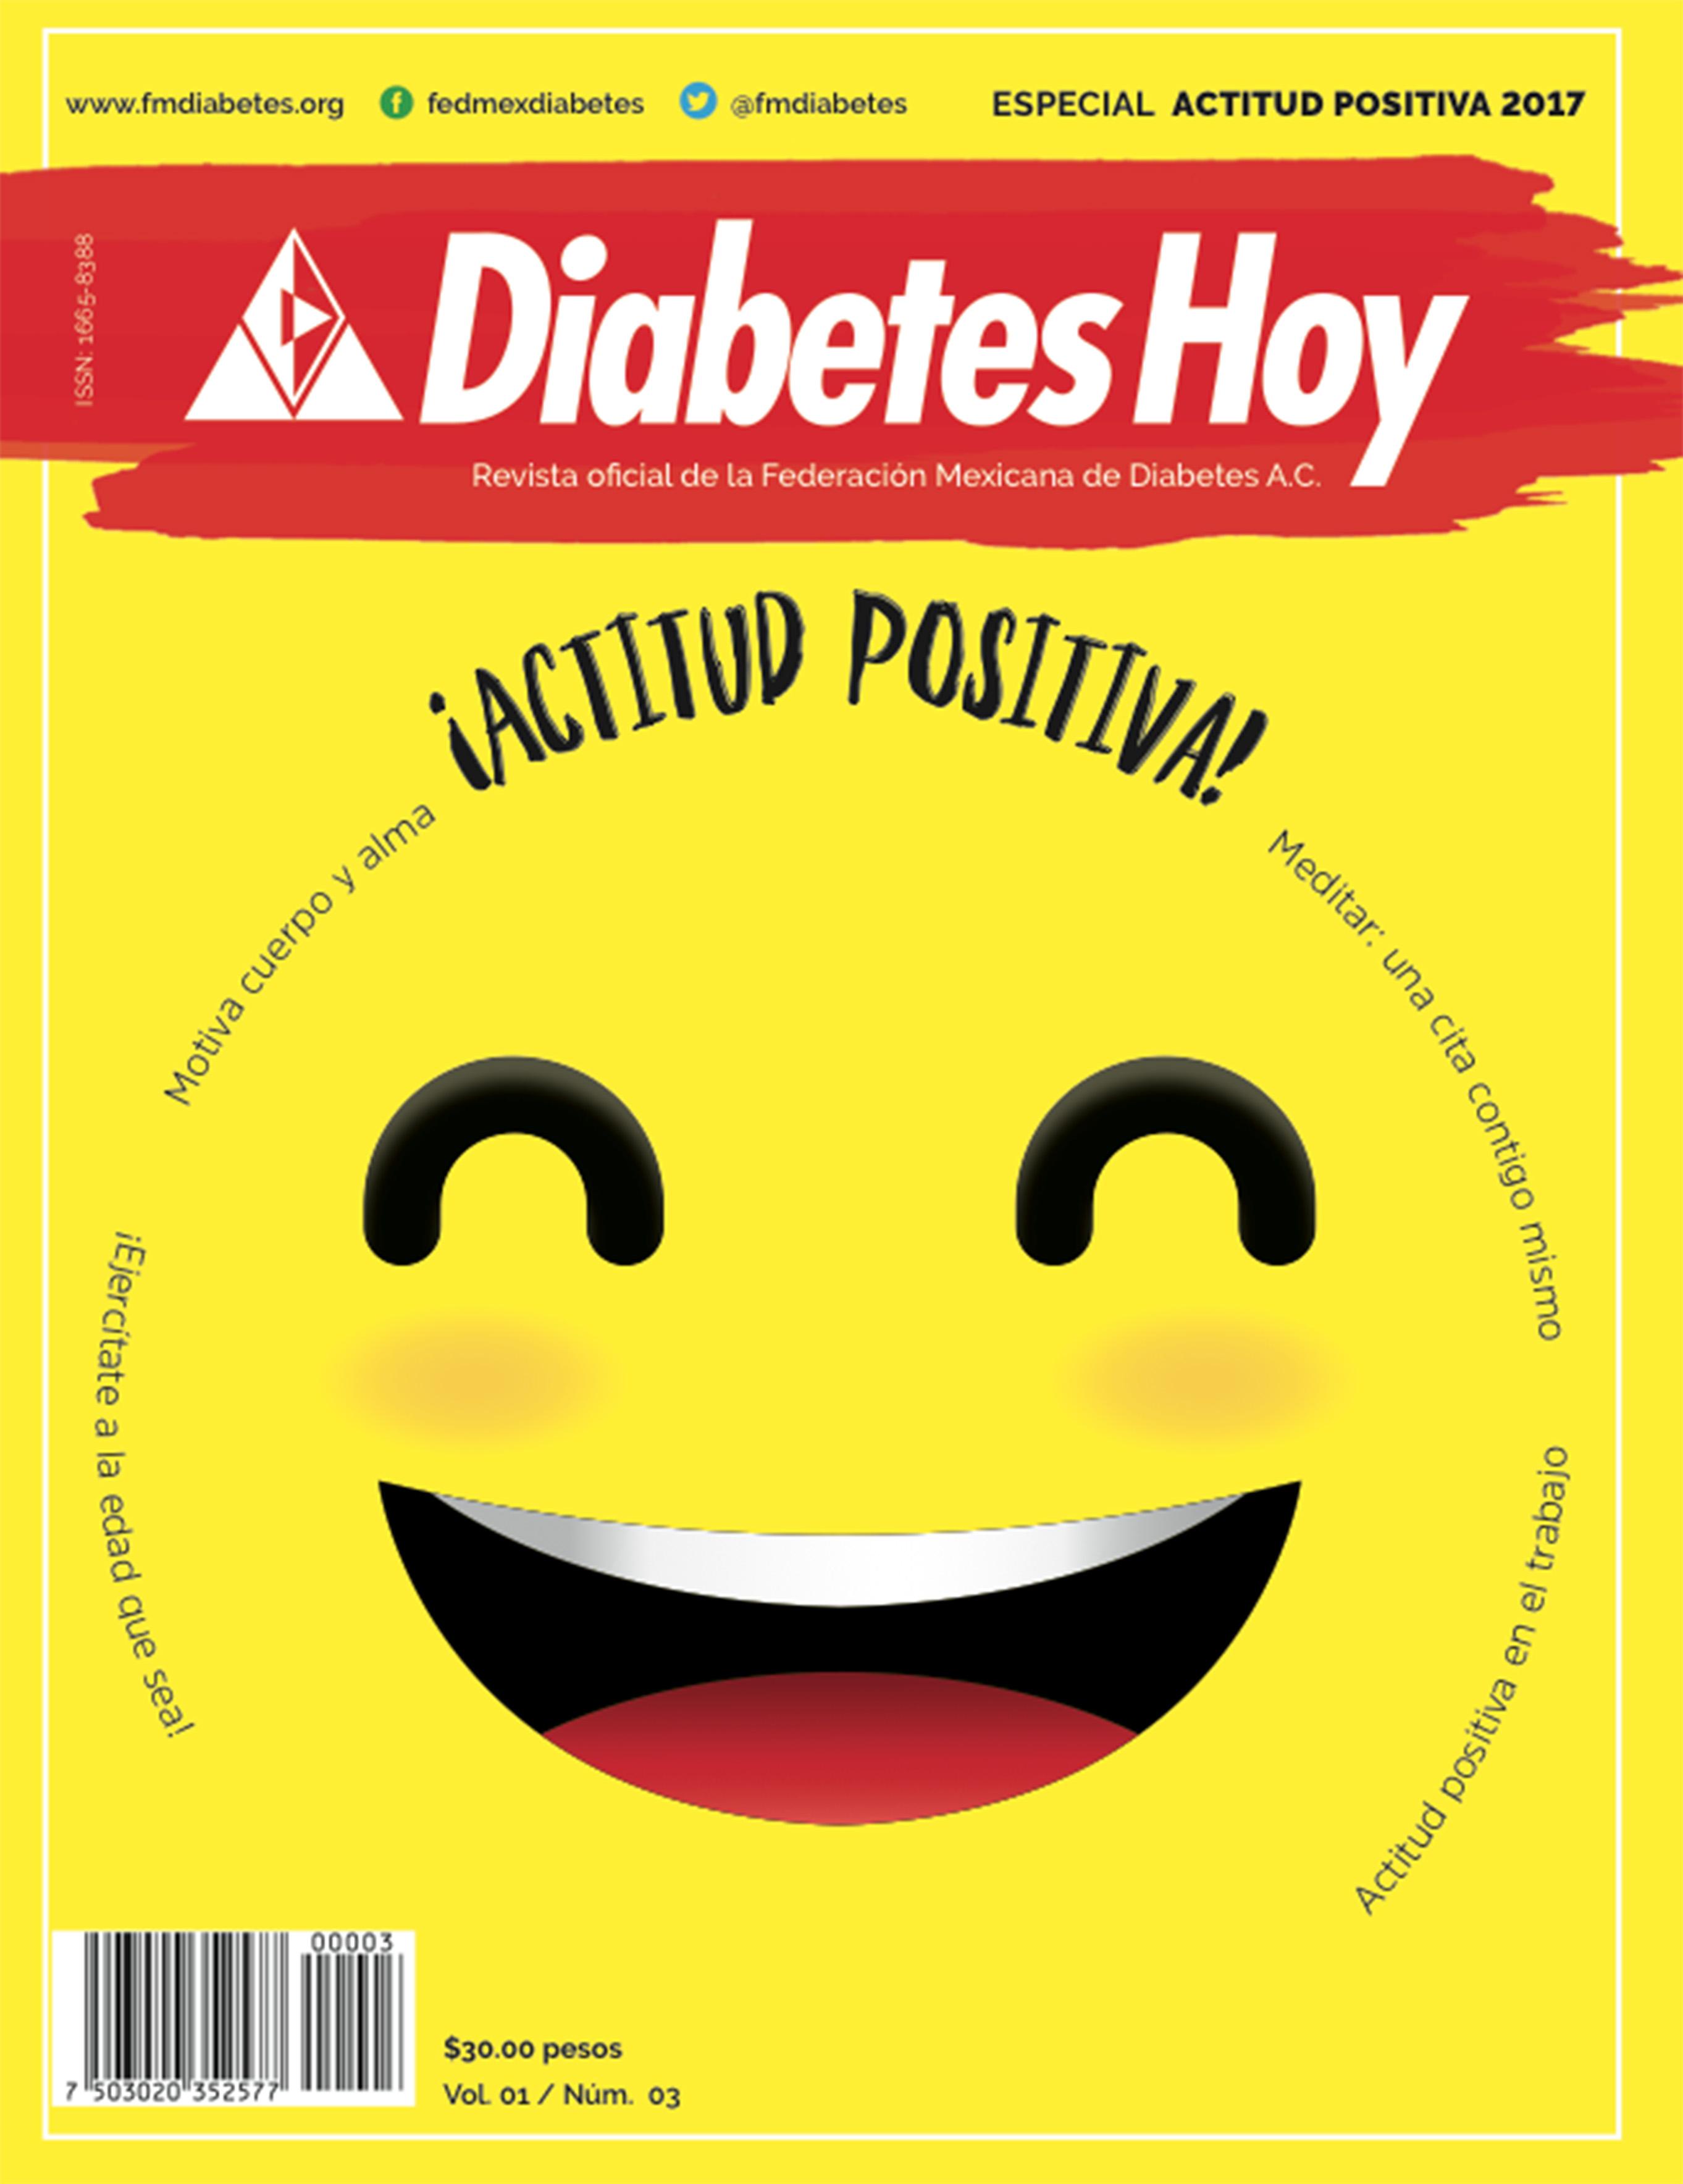 Revista Diabetes Hoy edición especial: Actitud positiva 2017